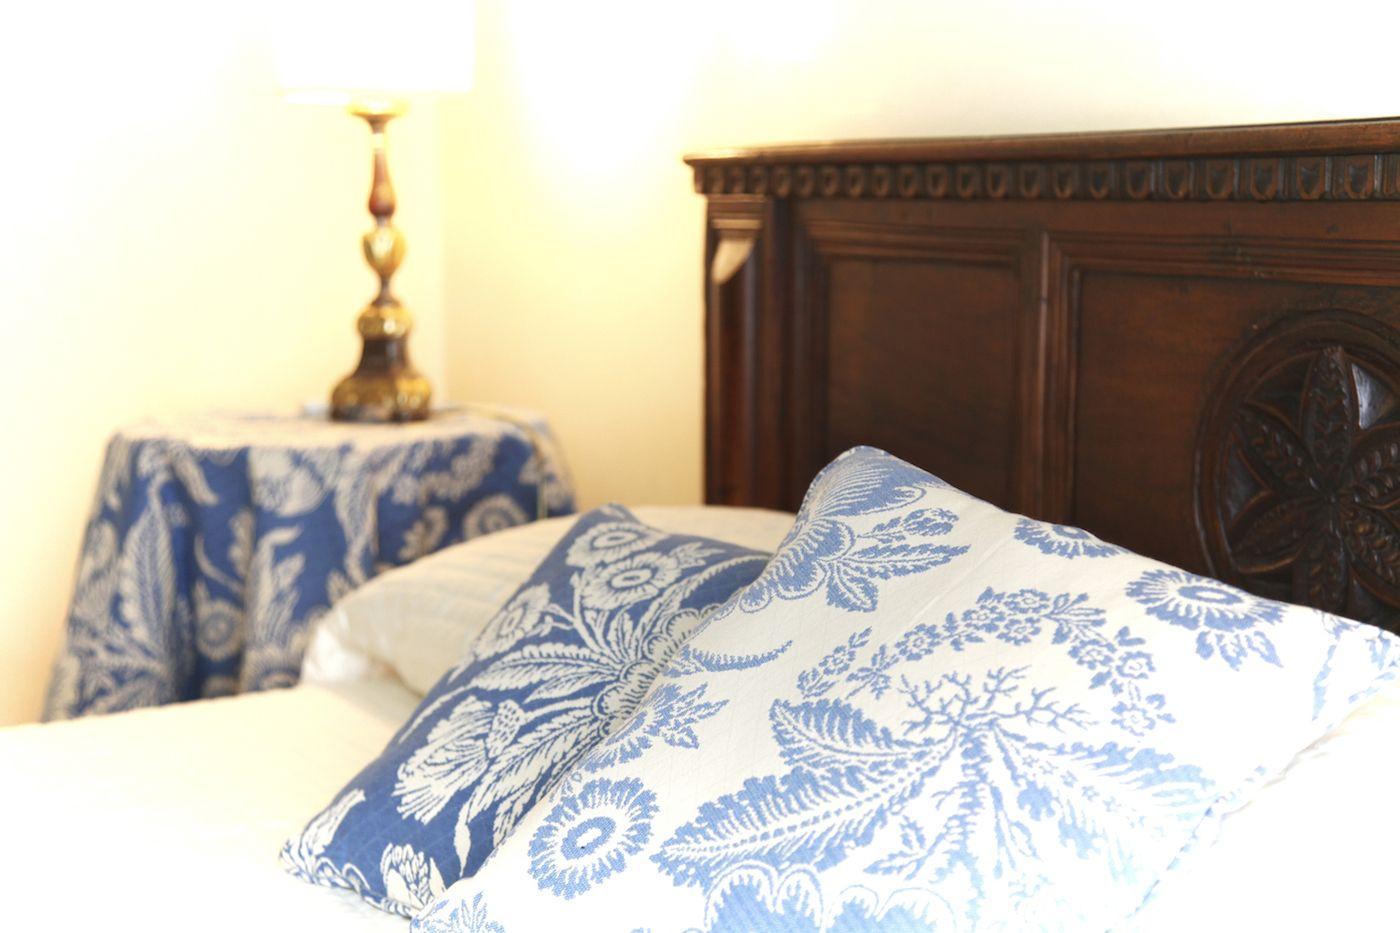 precious fabrics, classic furniture, sober colors...